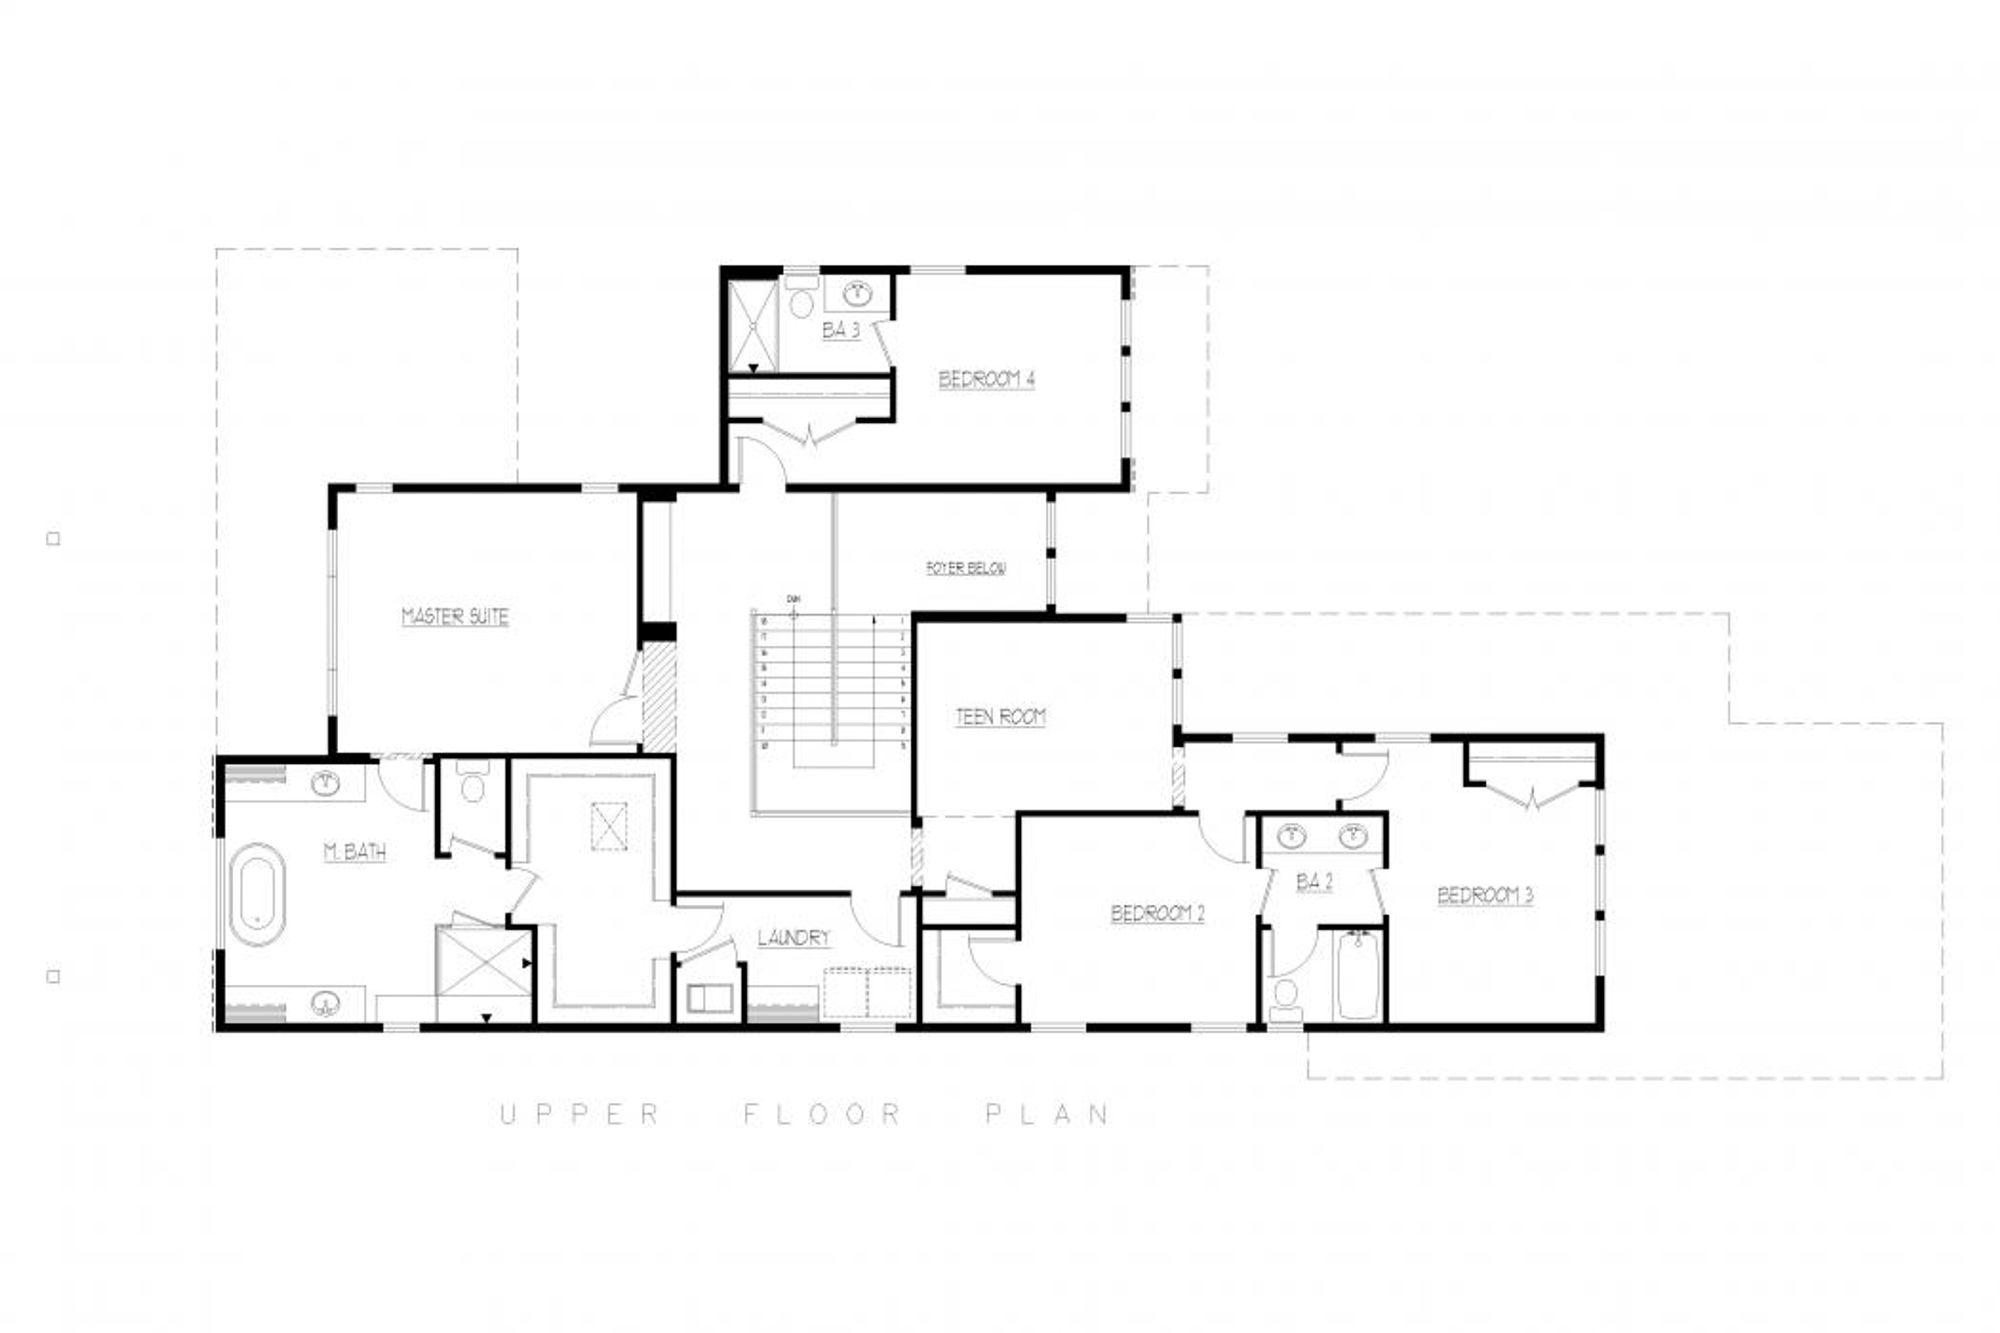 Tuscany Upper Floor Plan